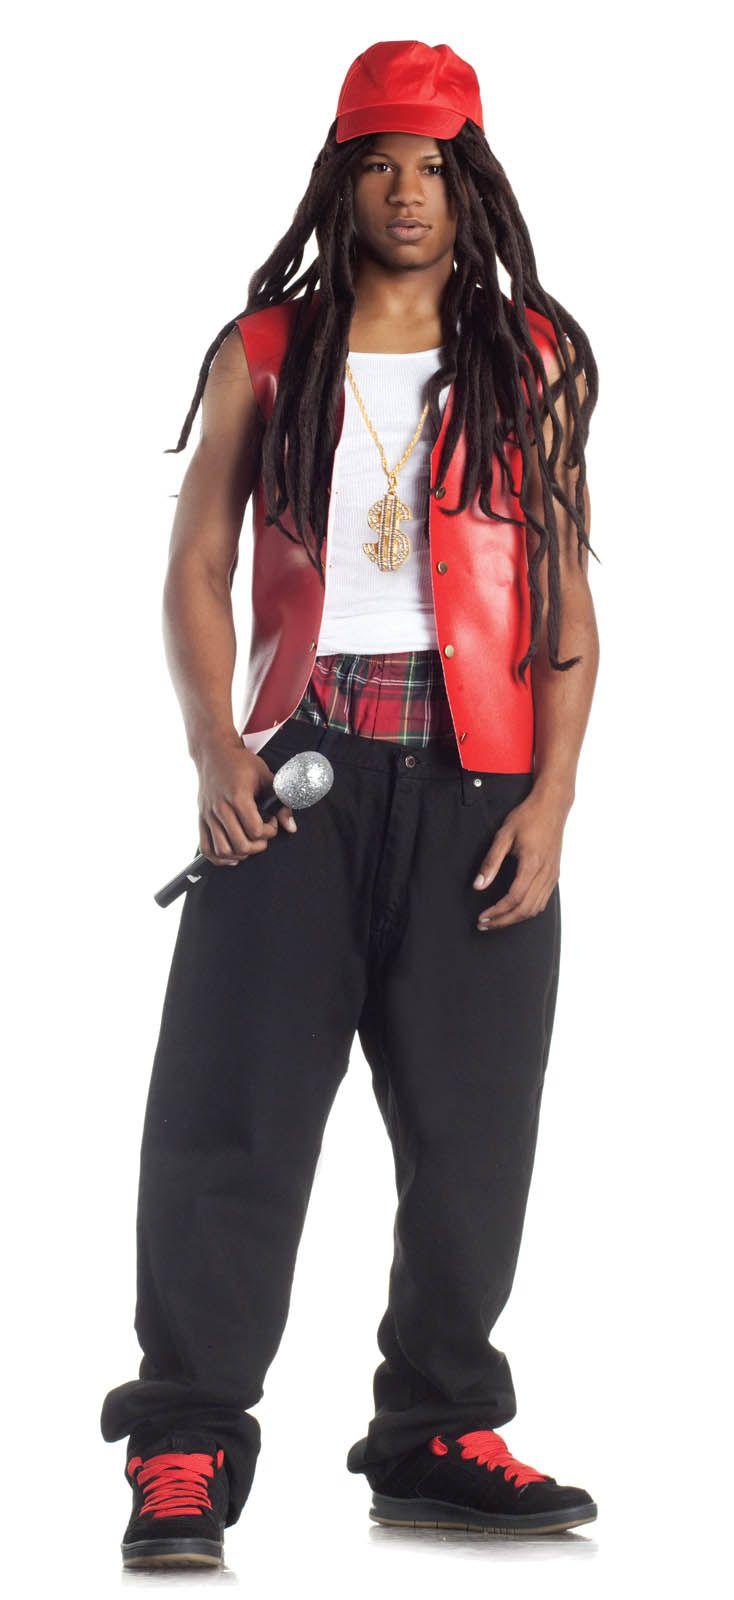 de6f971b03d Rapper Costume Gangsta Lil John Wayne Vest Bling Dreadlock Wig Mens Teen S  M L in Clothing